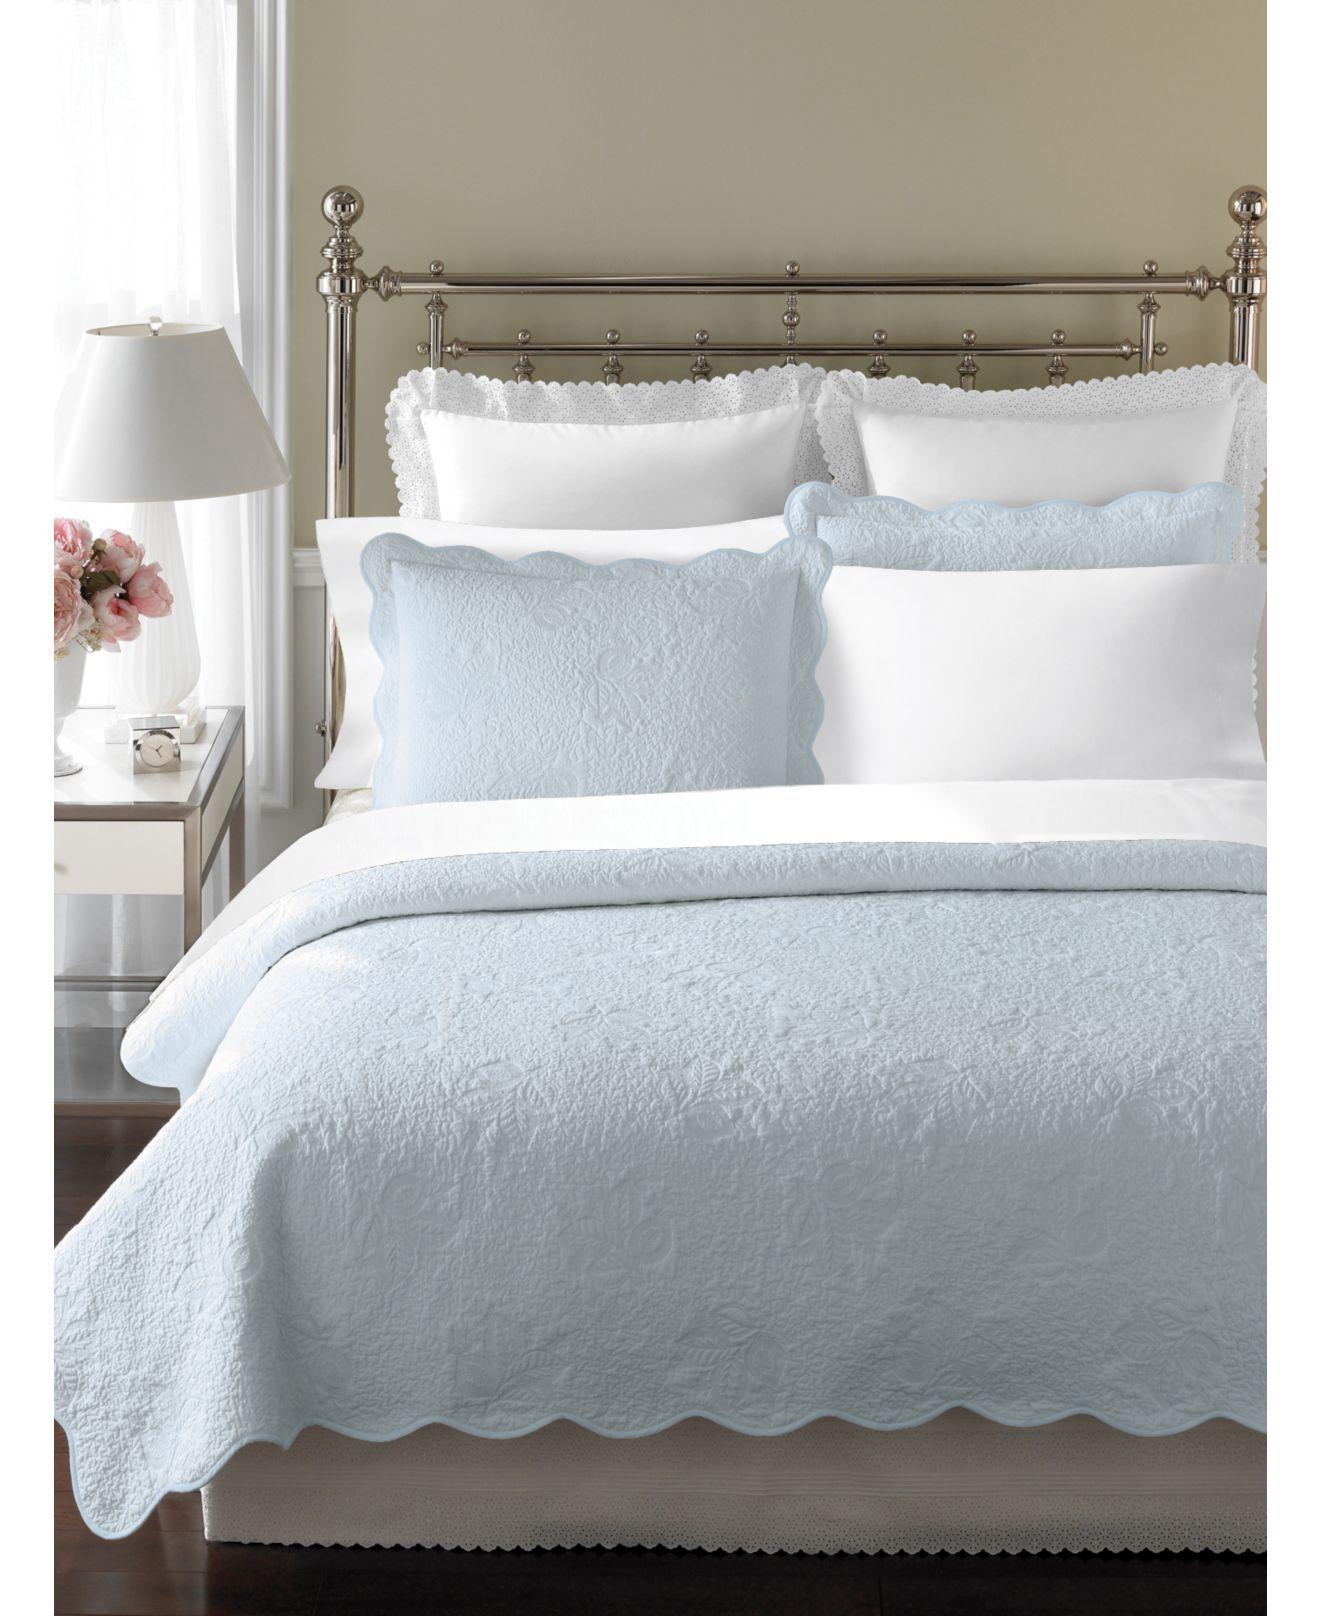 Martha Stewart Bedroom Furniture Martha Stewart Collection Bedding Stenciled Leaves King Quilt